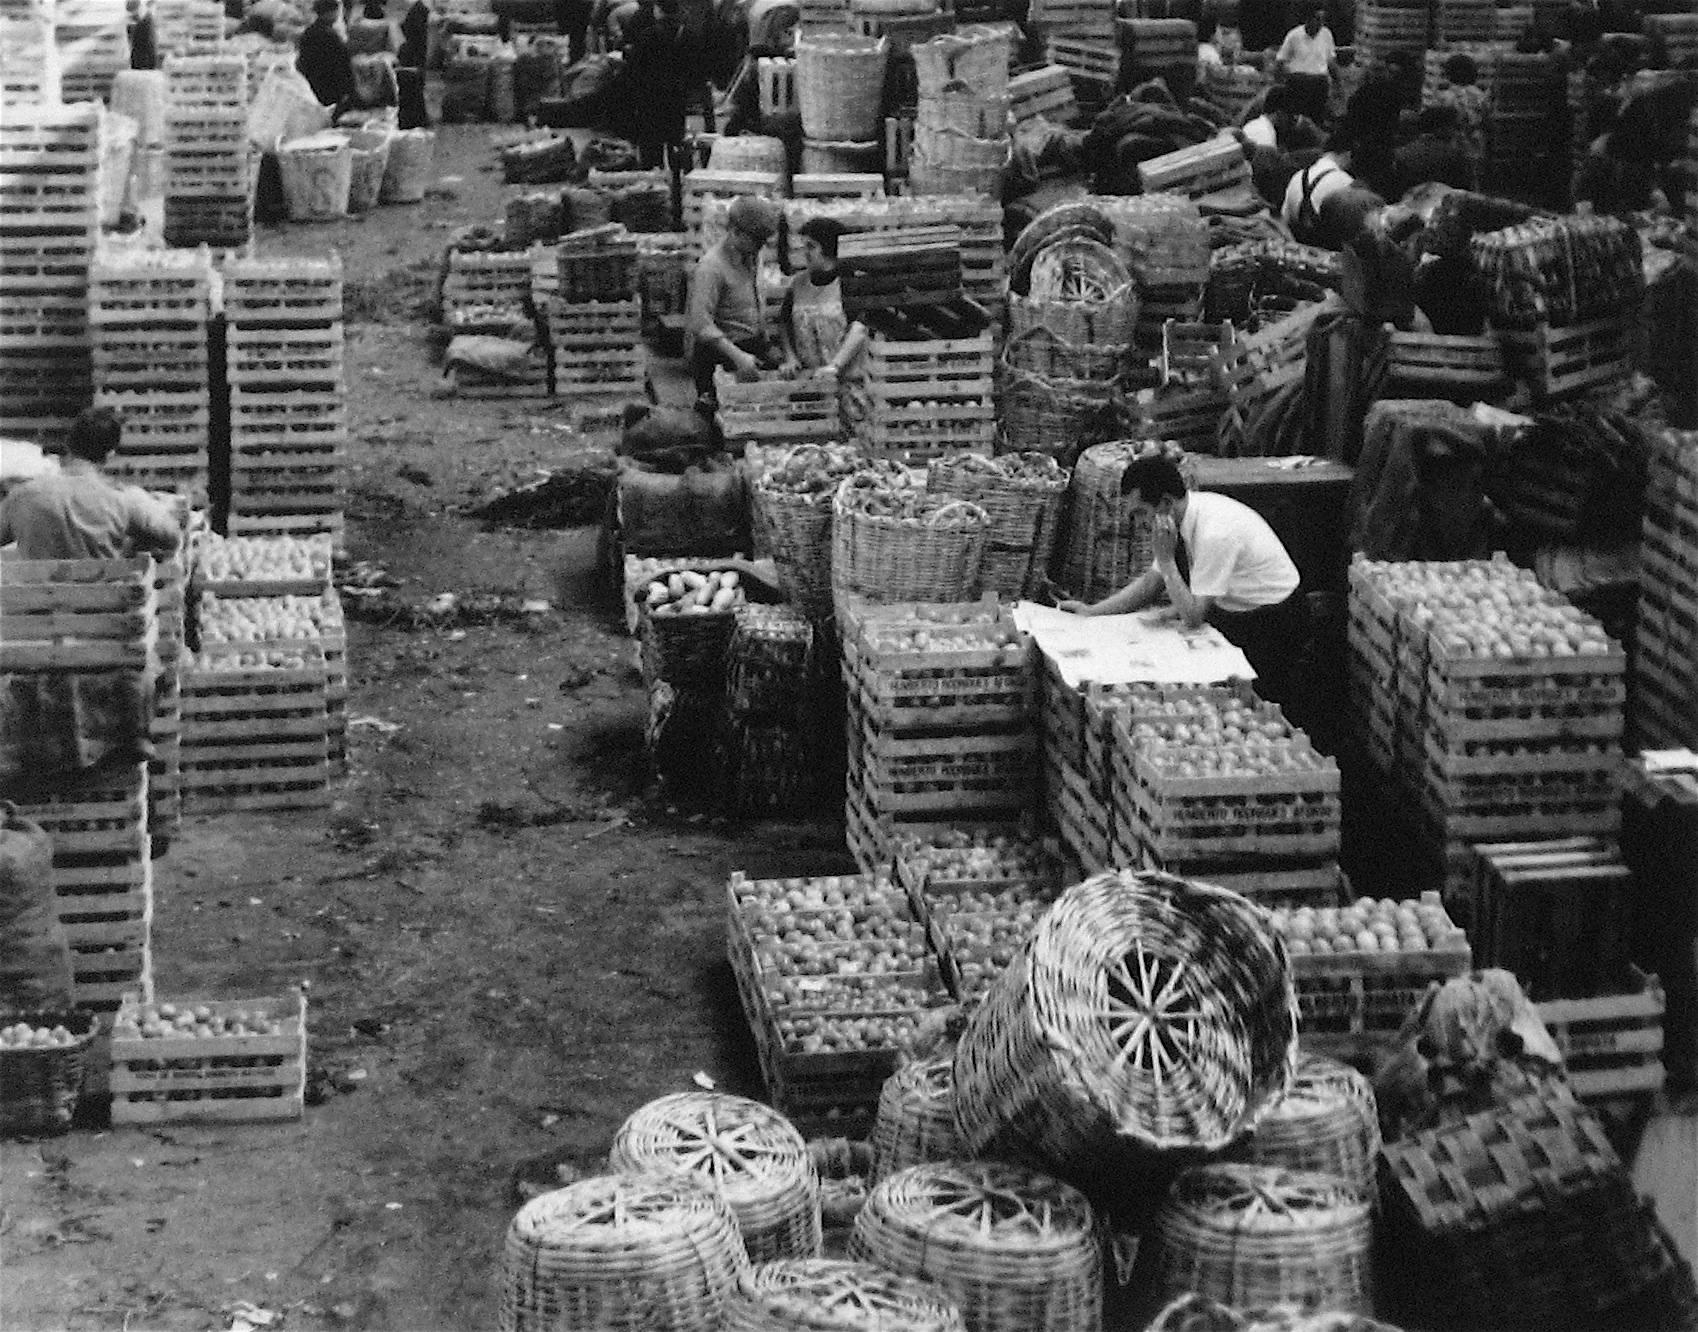 Lisbon, Portugal Marketplace, Black and White Photograph, 1960s